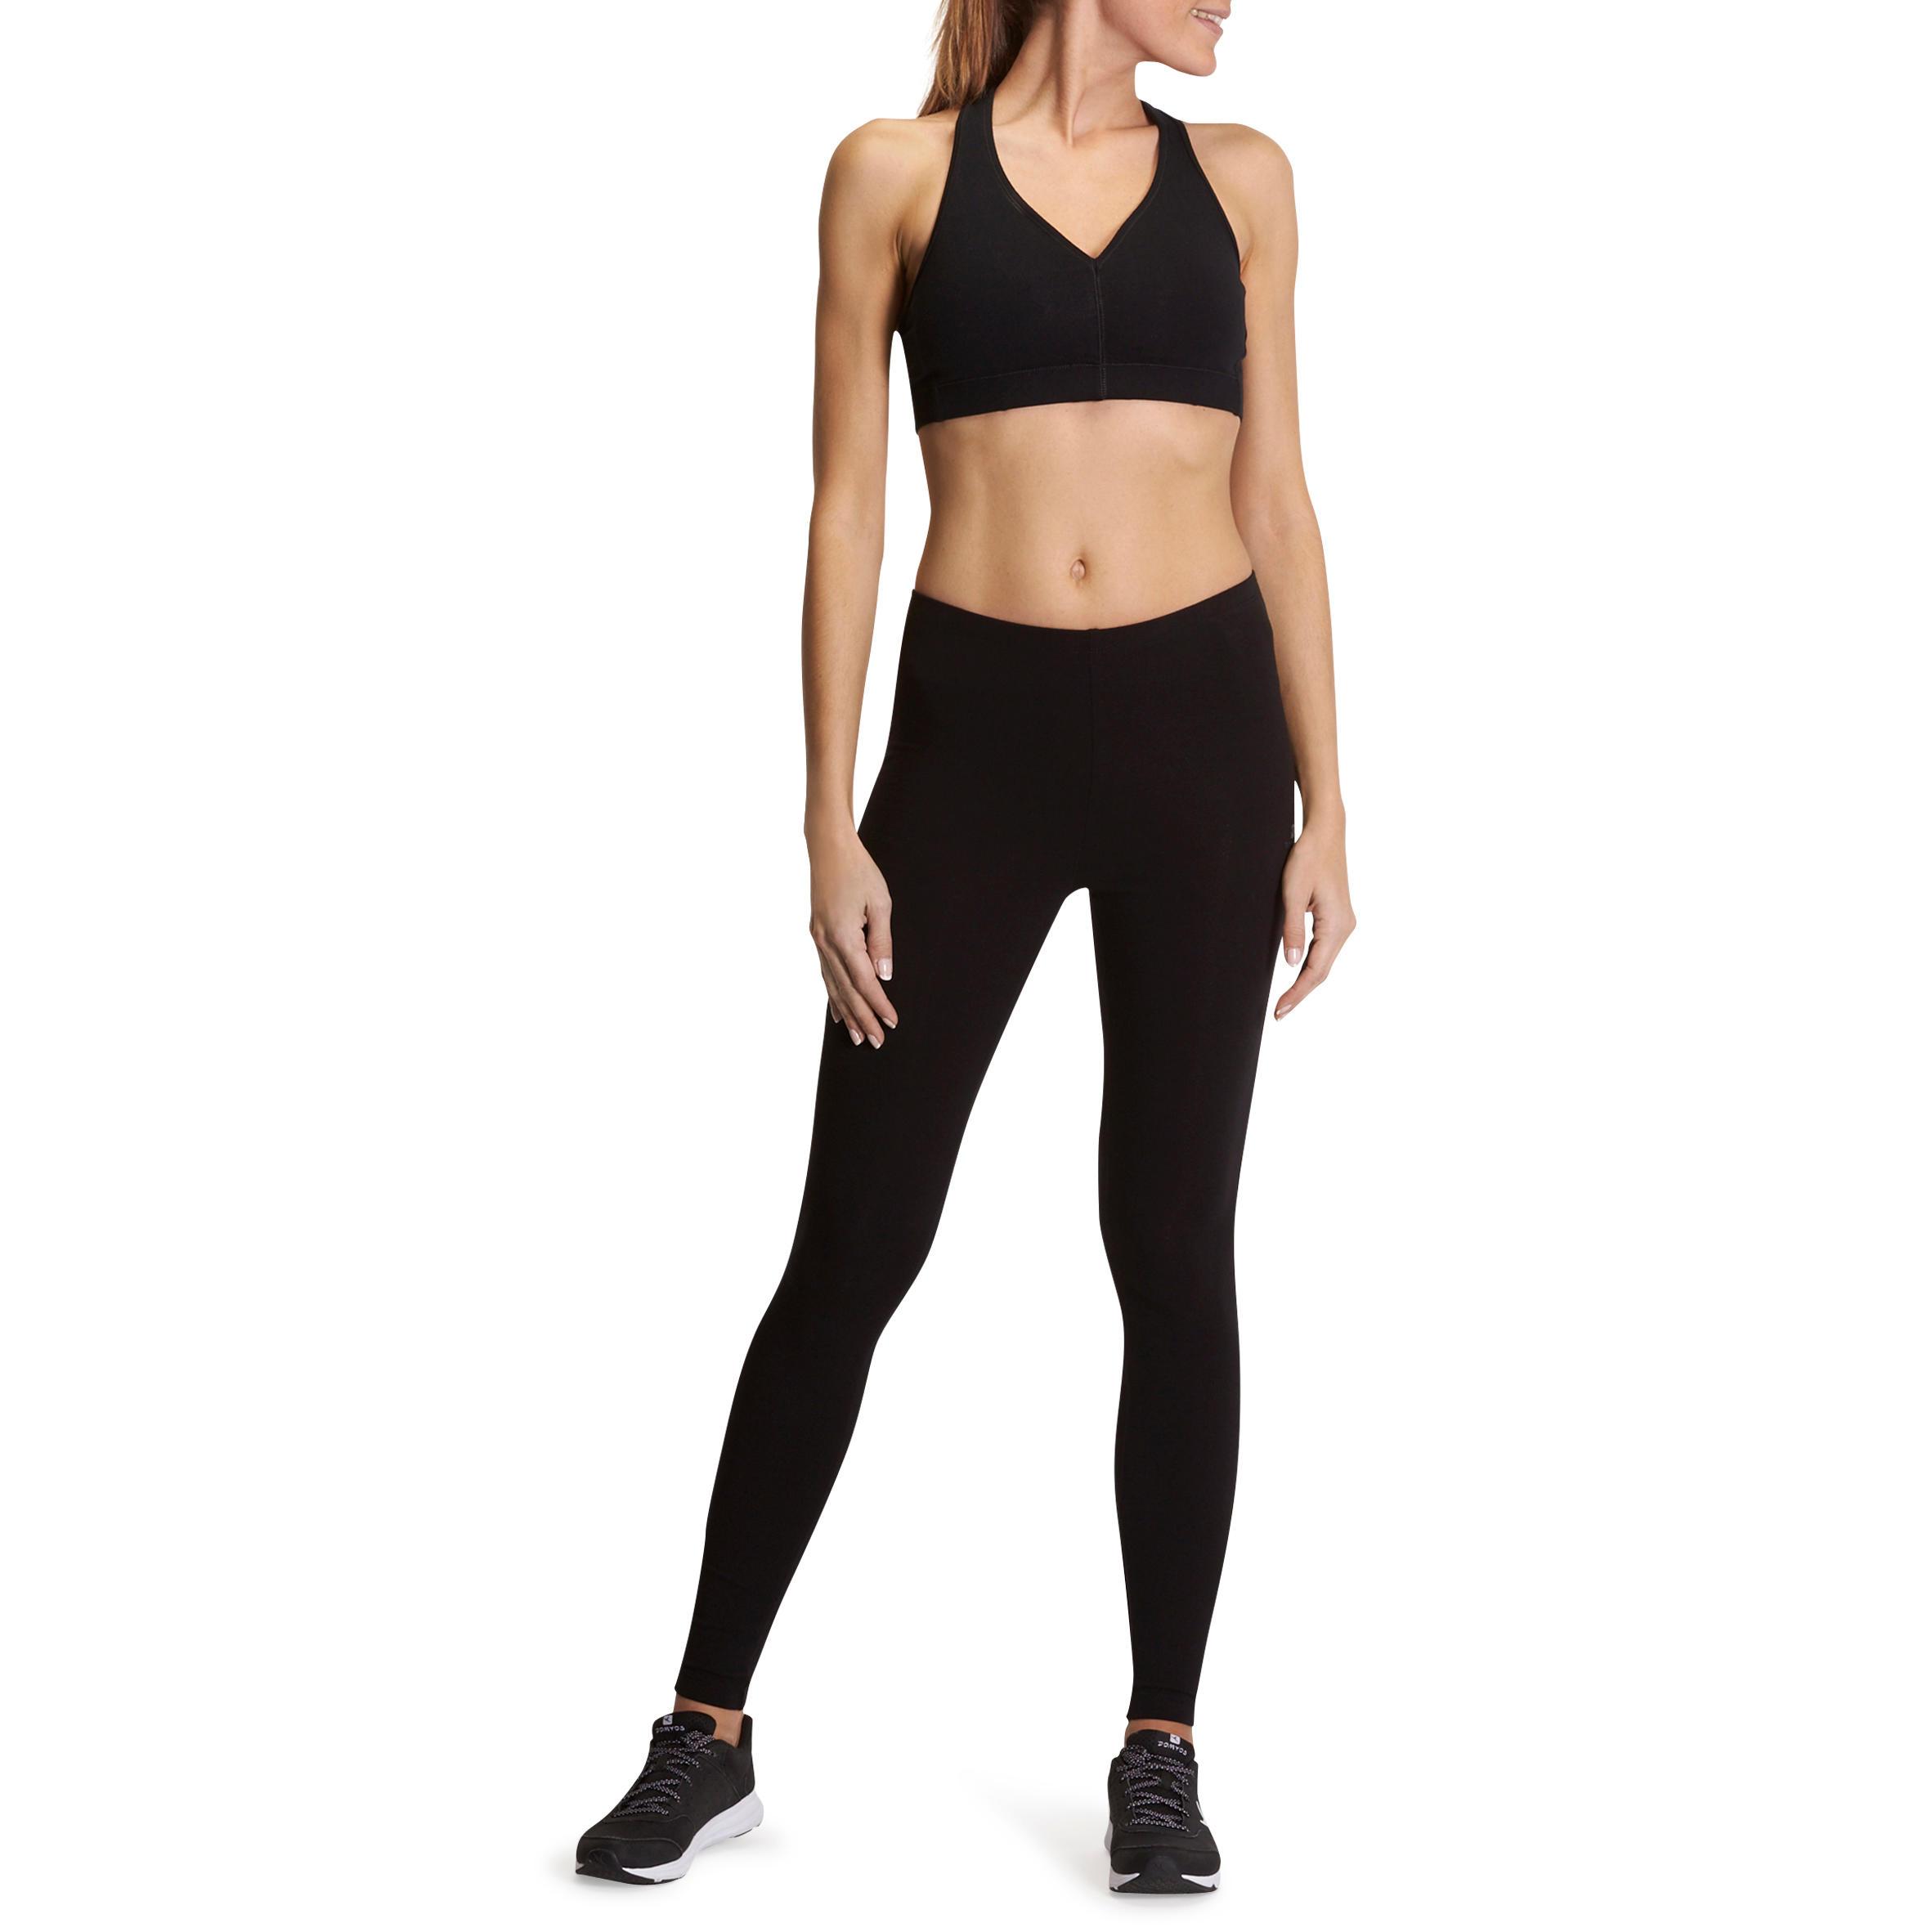 de2b88b0a Leggings FIT+ SALTO fitness mujer negro - Decathlon